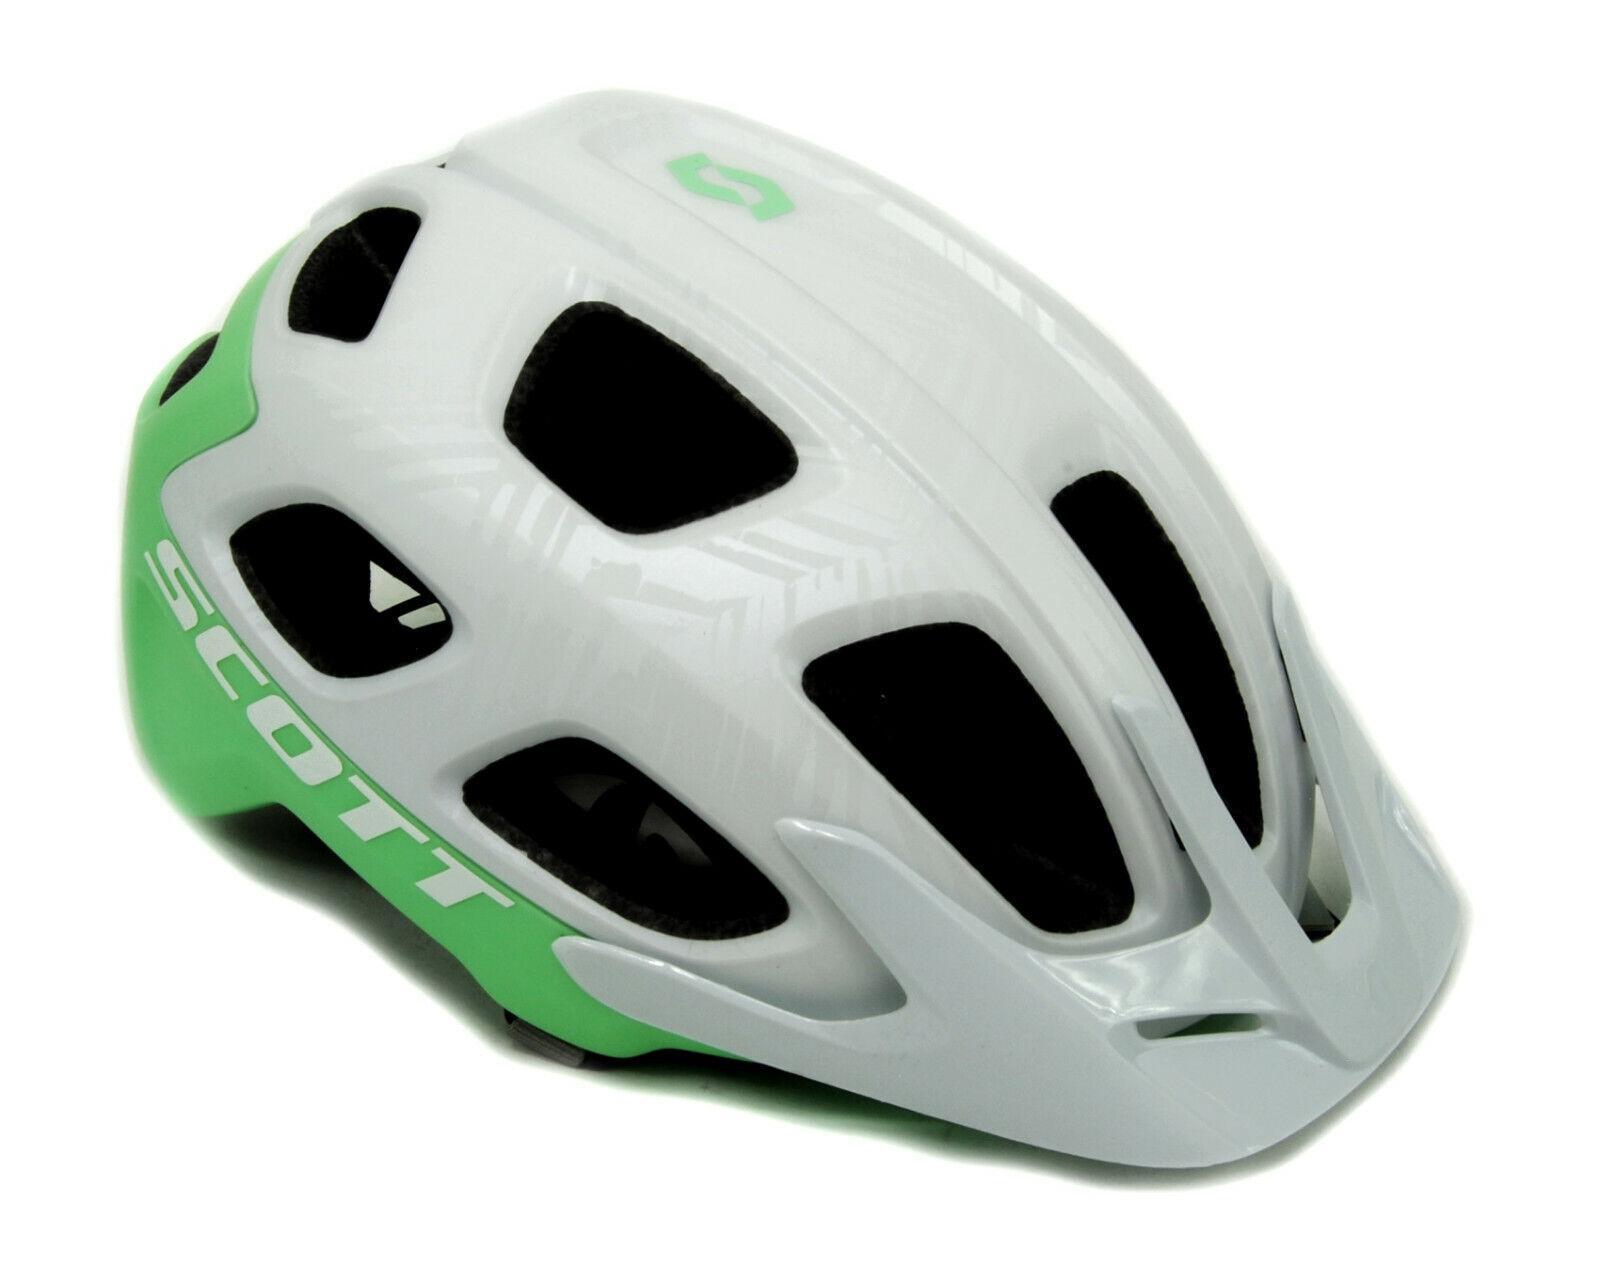 Scott Vivo Plus MIPS Bicycle Helmet Small 51-55cm $120 MSRP White//Mint Green